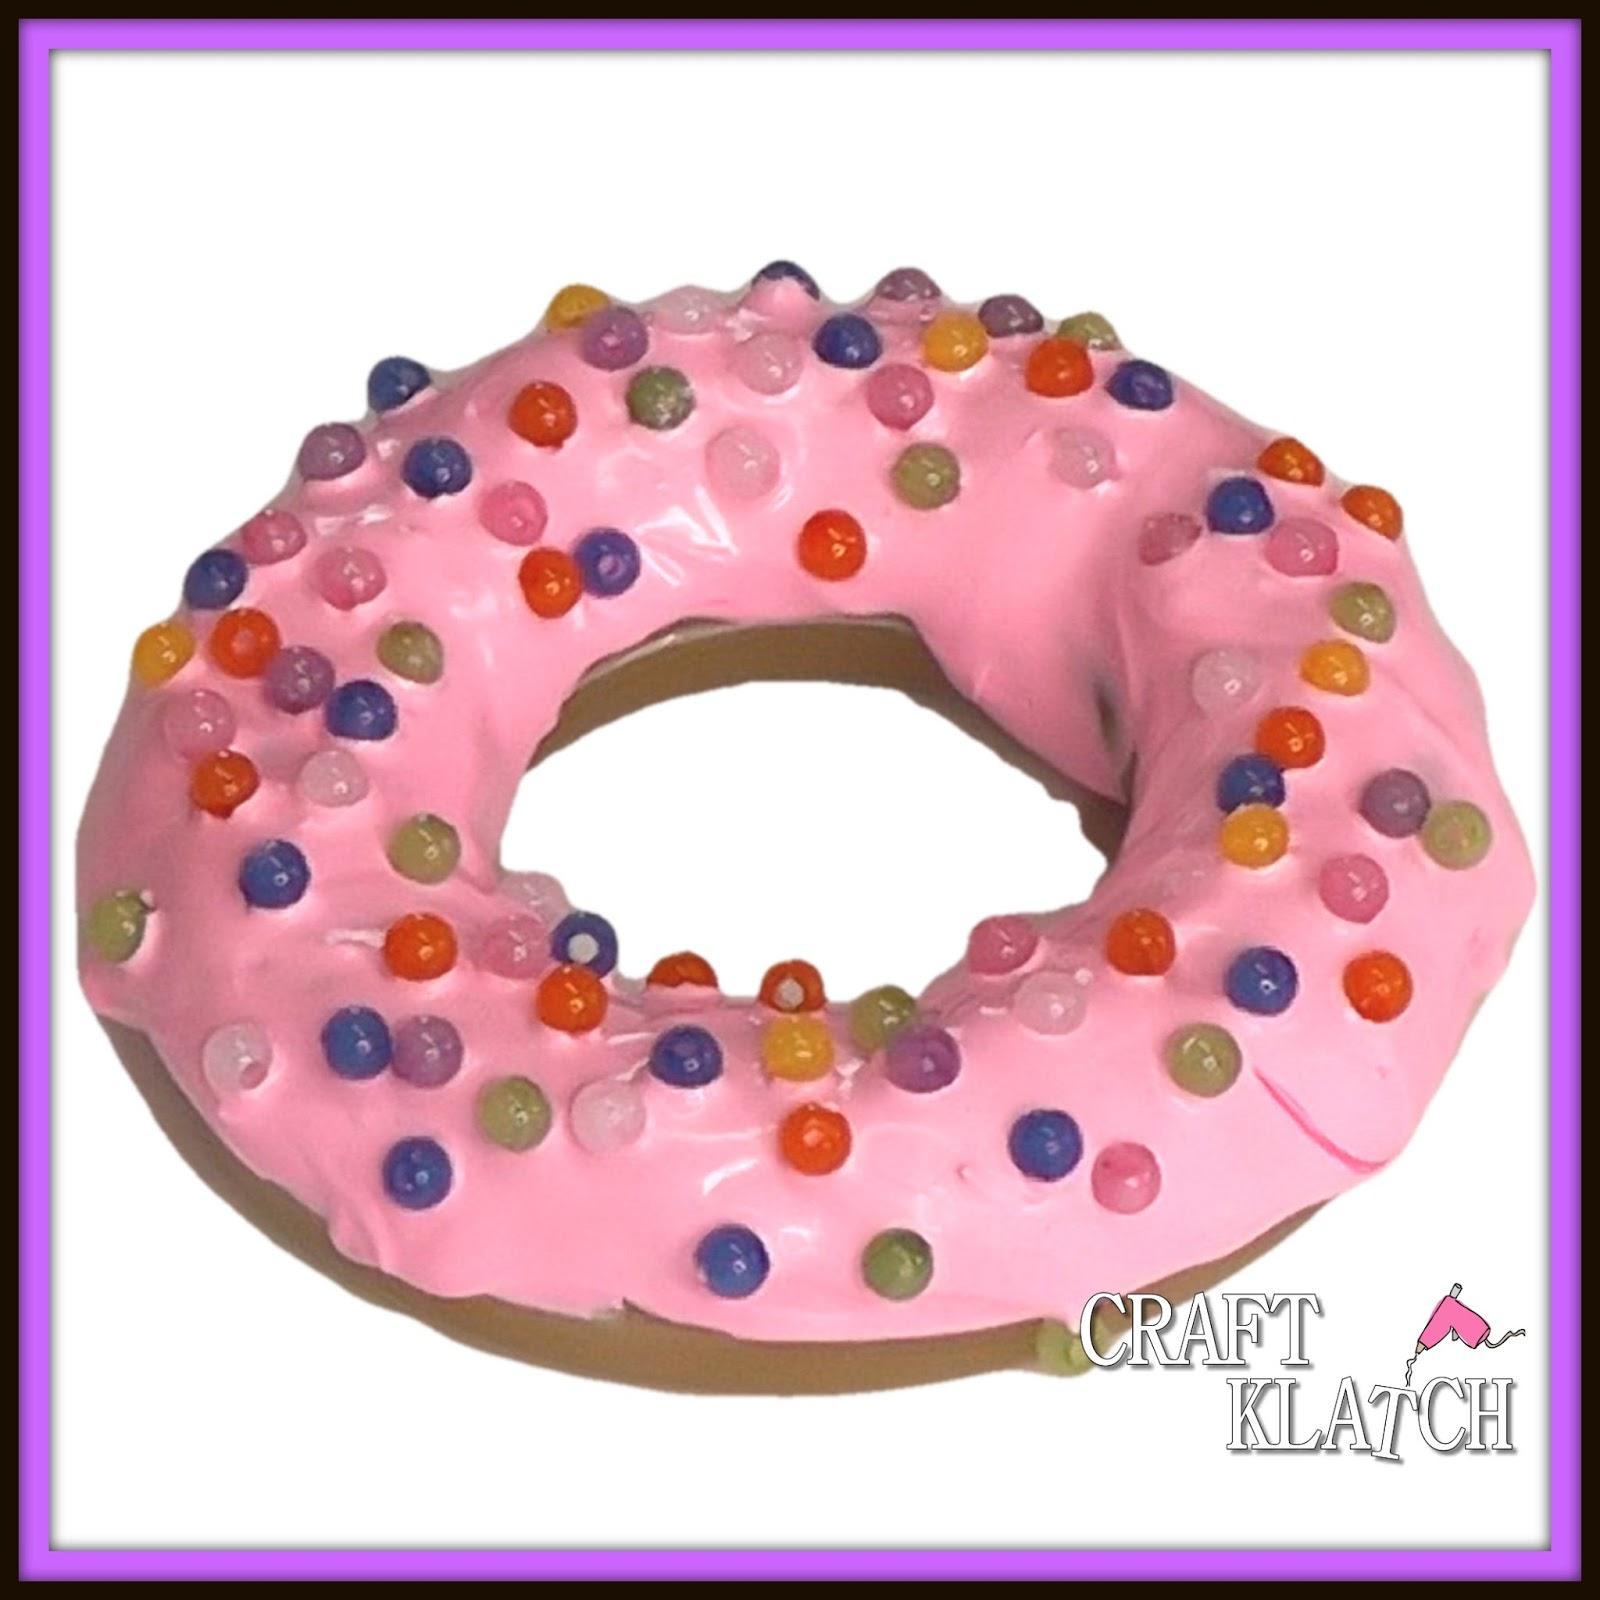 Craft Klatch Diy Resin Donut Paperweight Craft Klatch How To